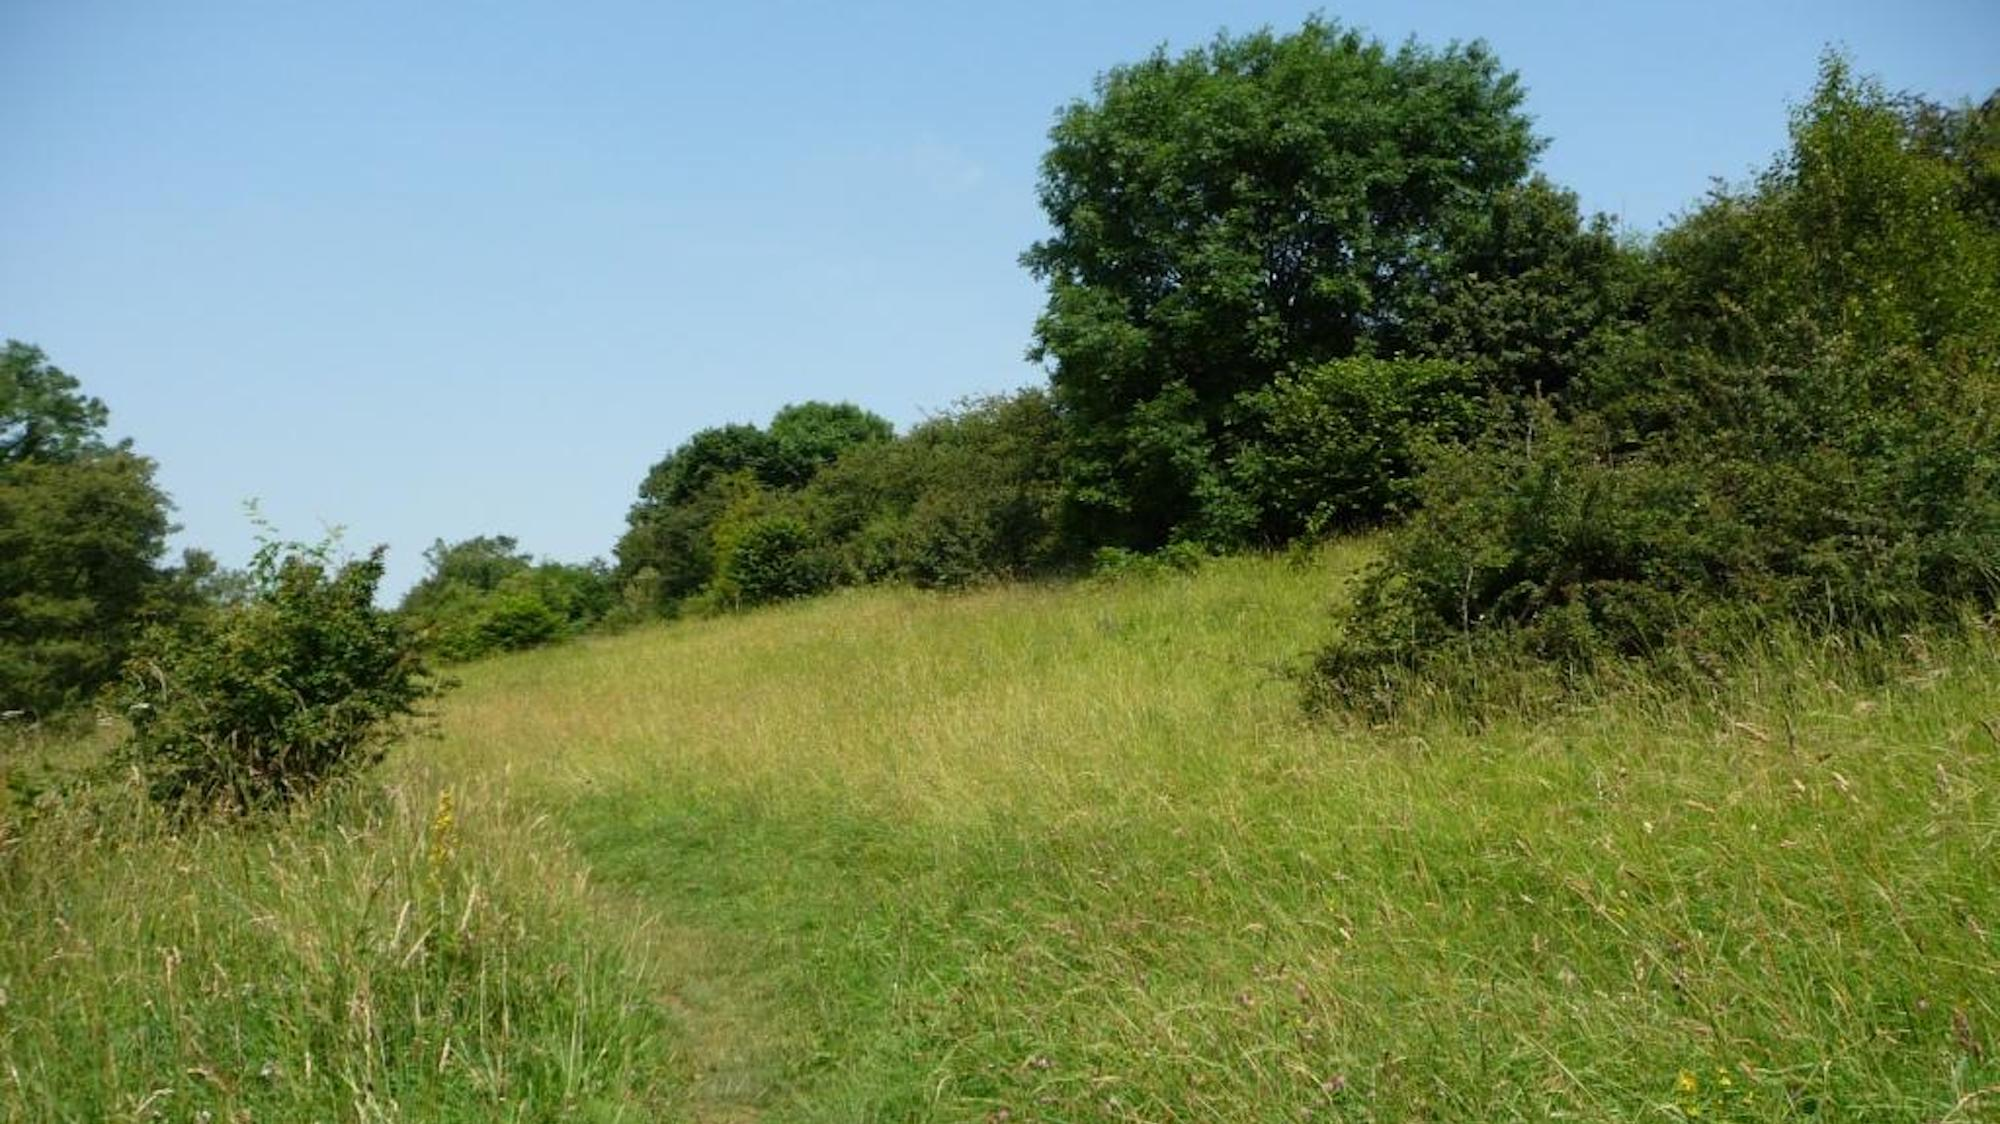 Hetchell Wood Nature Reserve